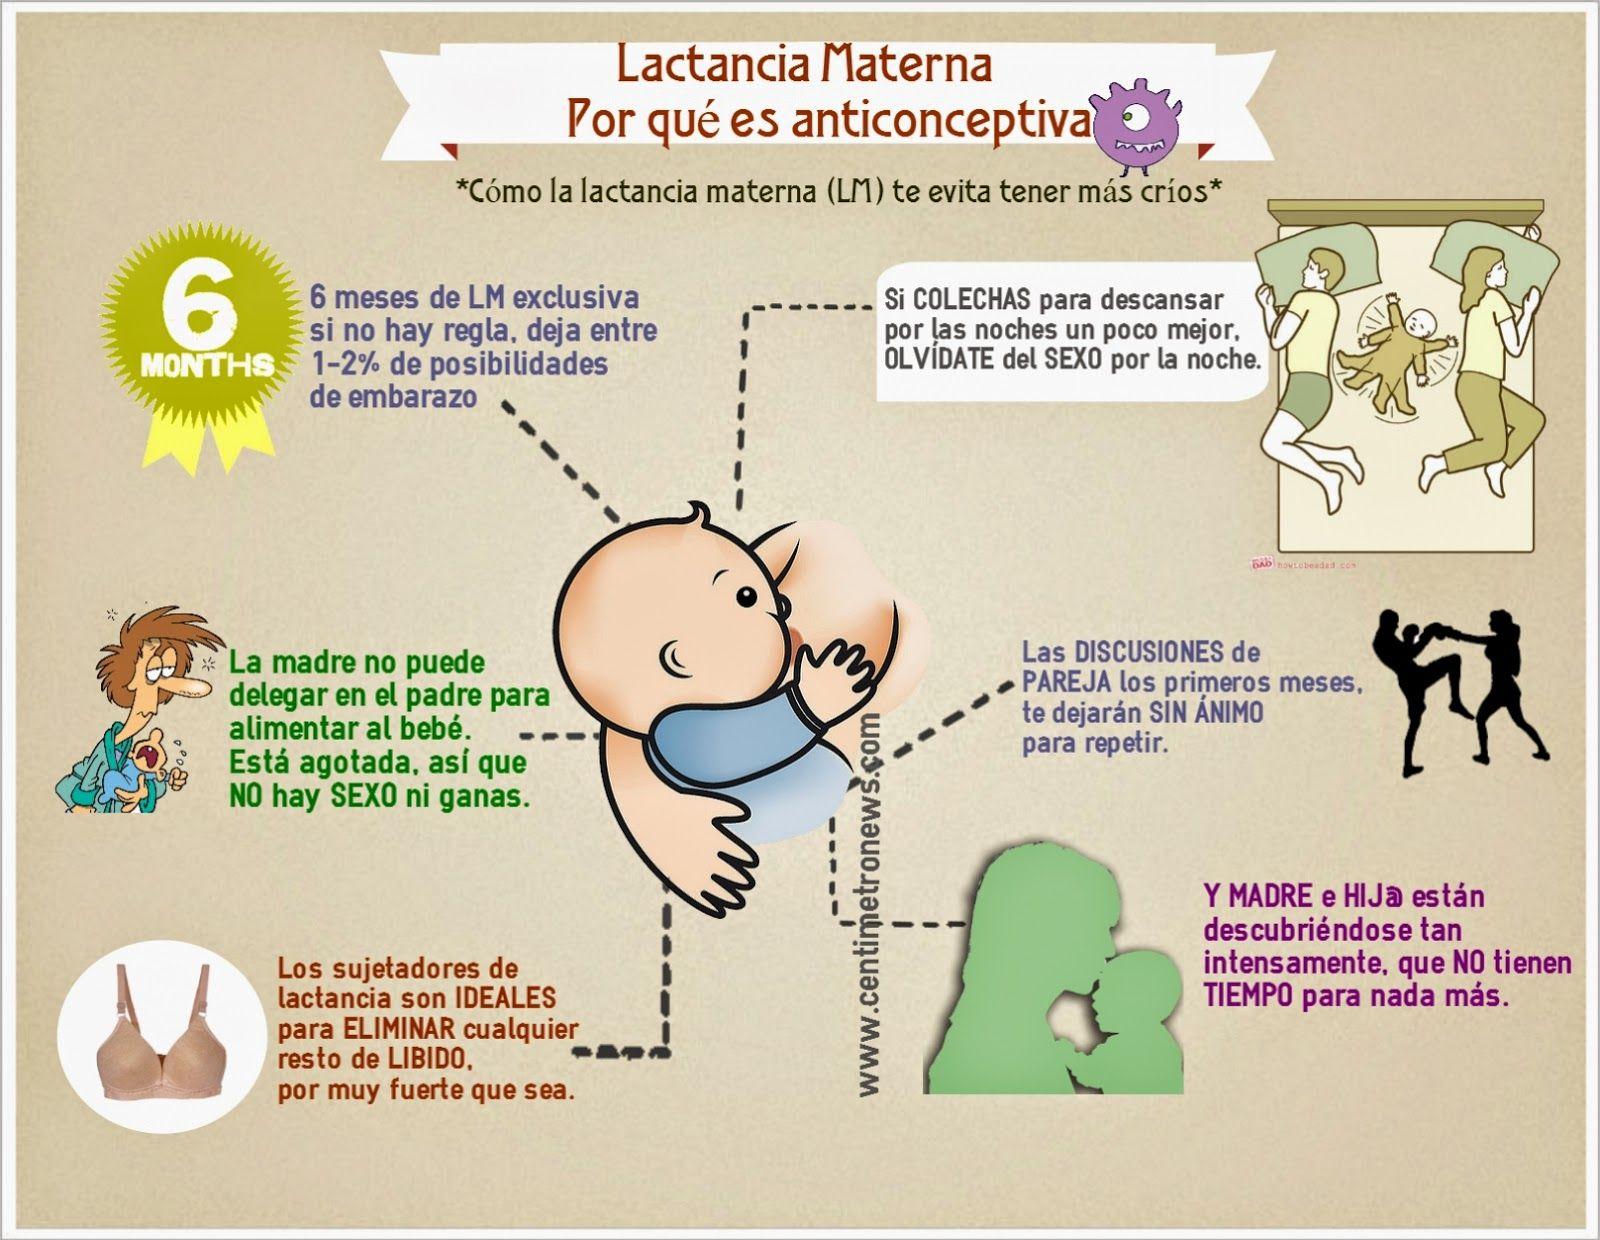 Lactancia materna y anticoncepci n breastfeeding lactancia materna pinterest lactancia - Alimentos para producir leche materna ...